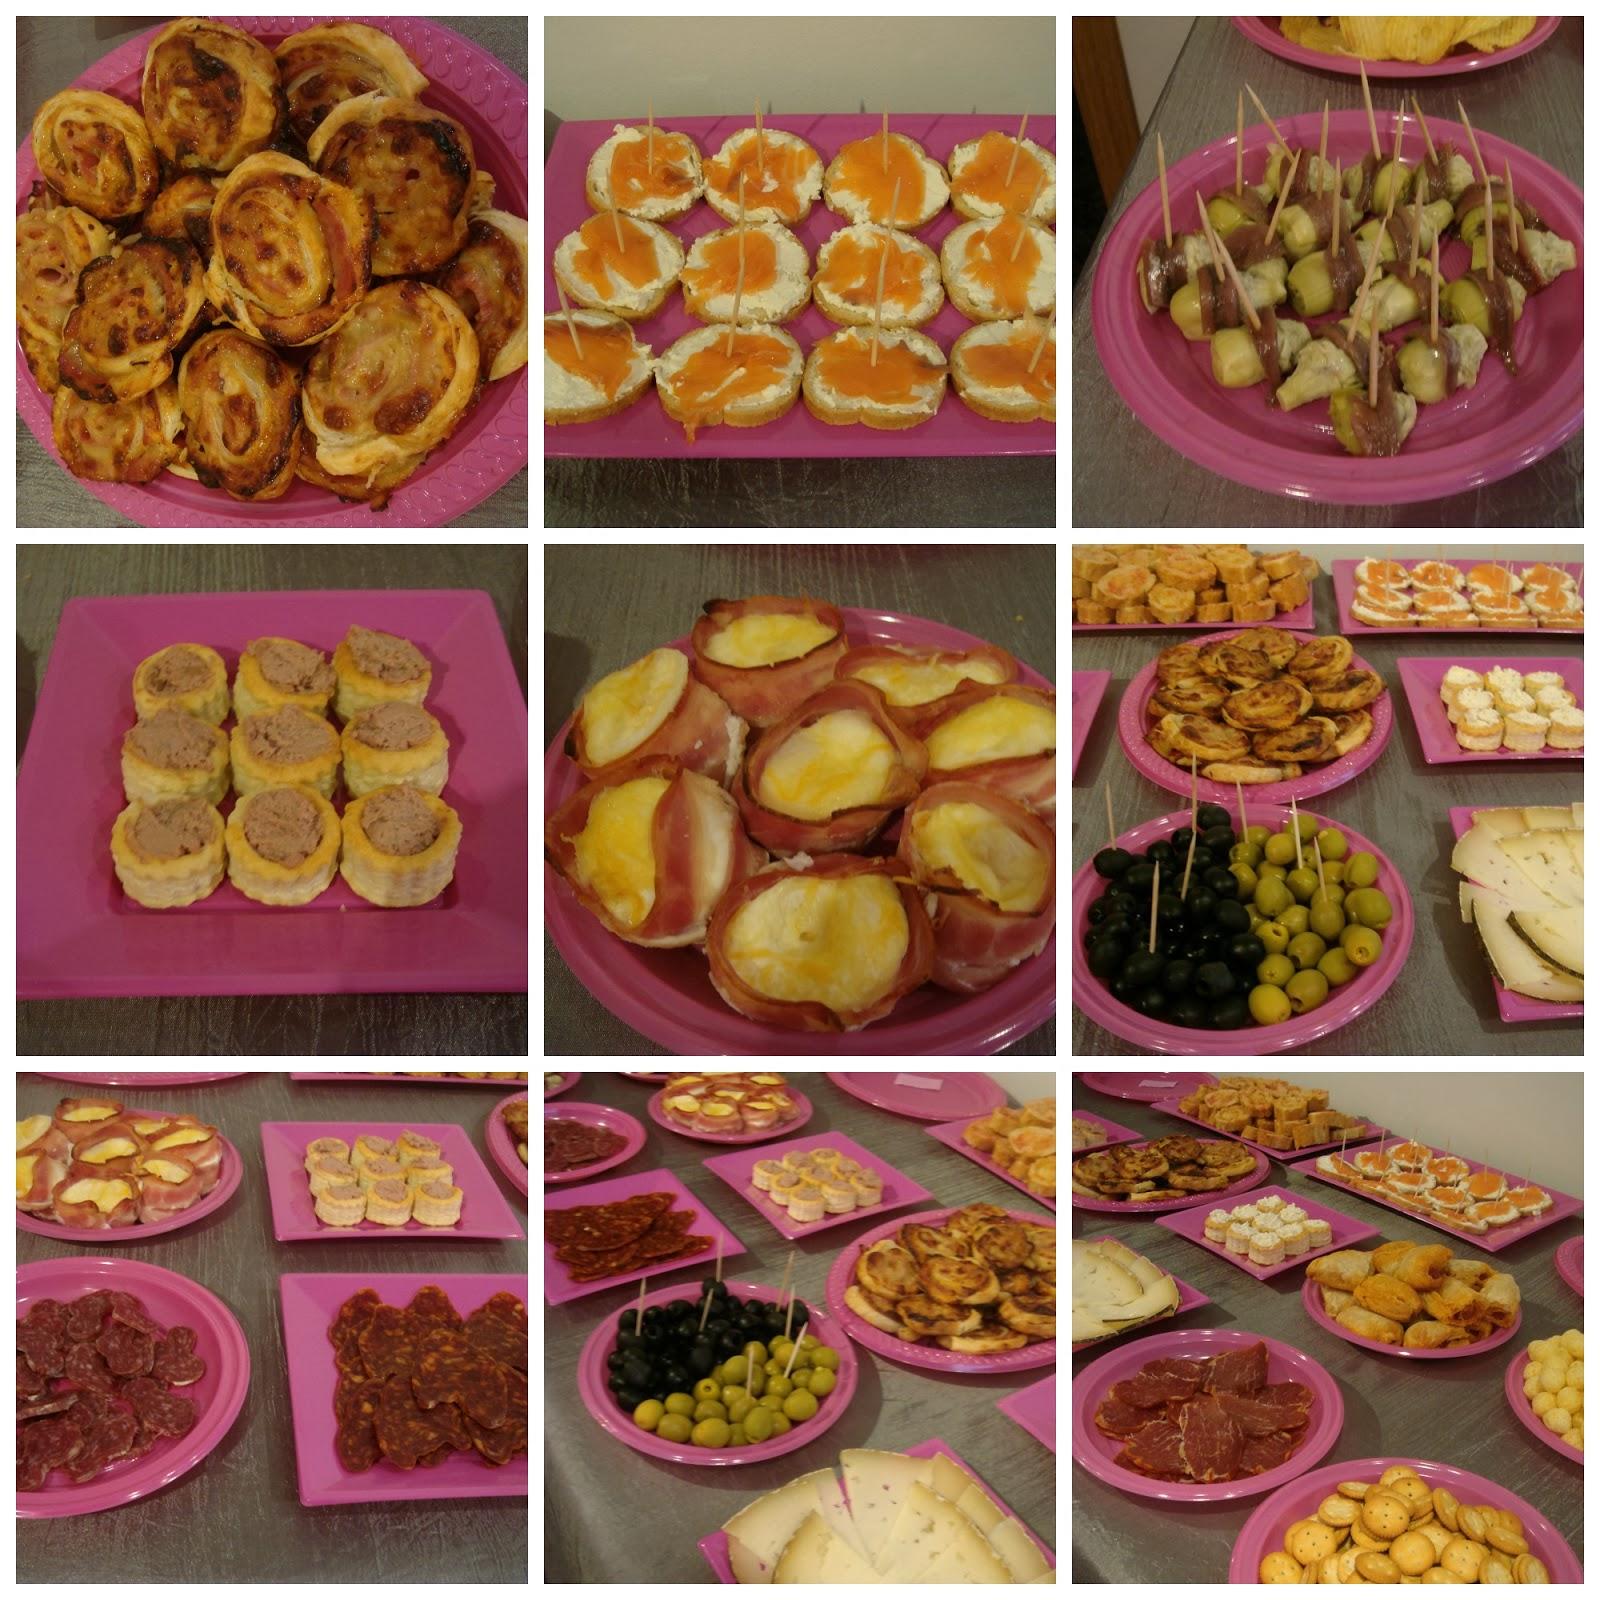 Recopilatorio de la mesa dulce - Incluia Cupcakes red velvet con crema